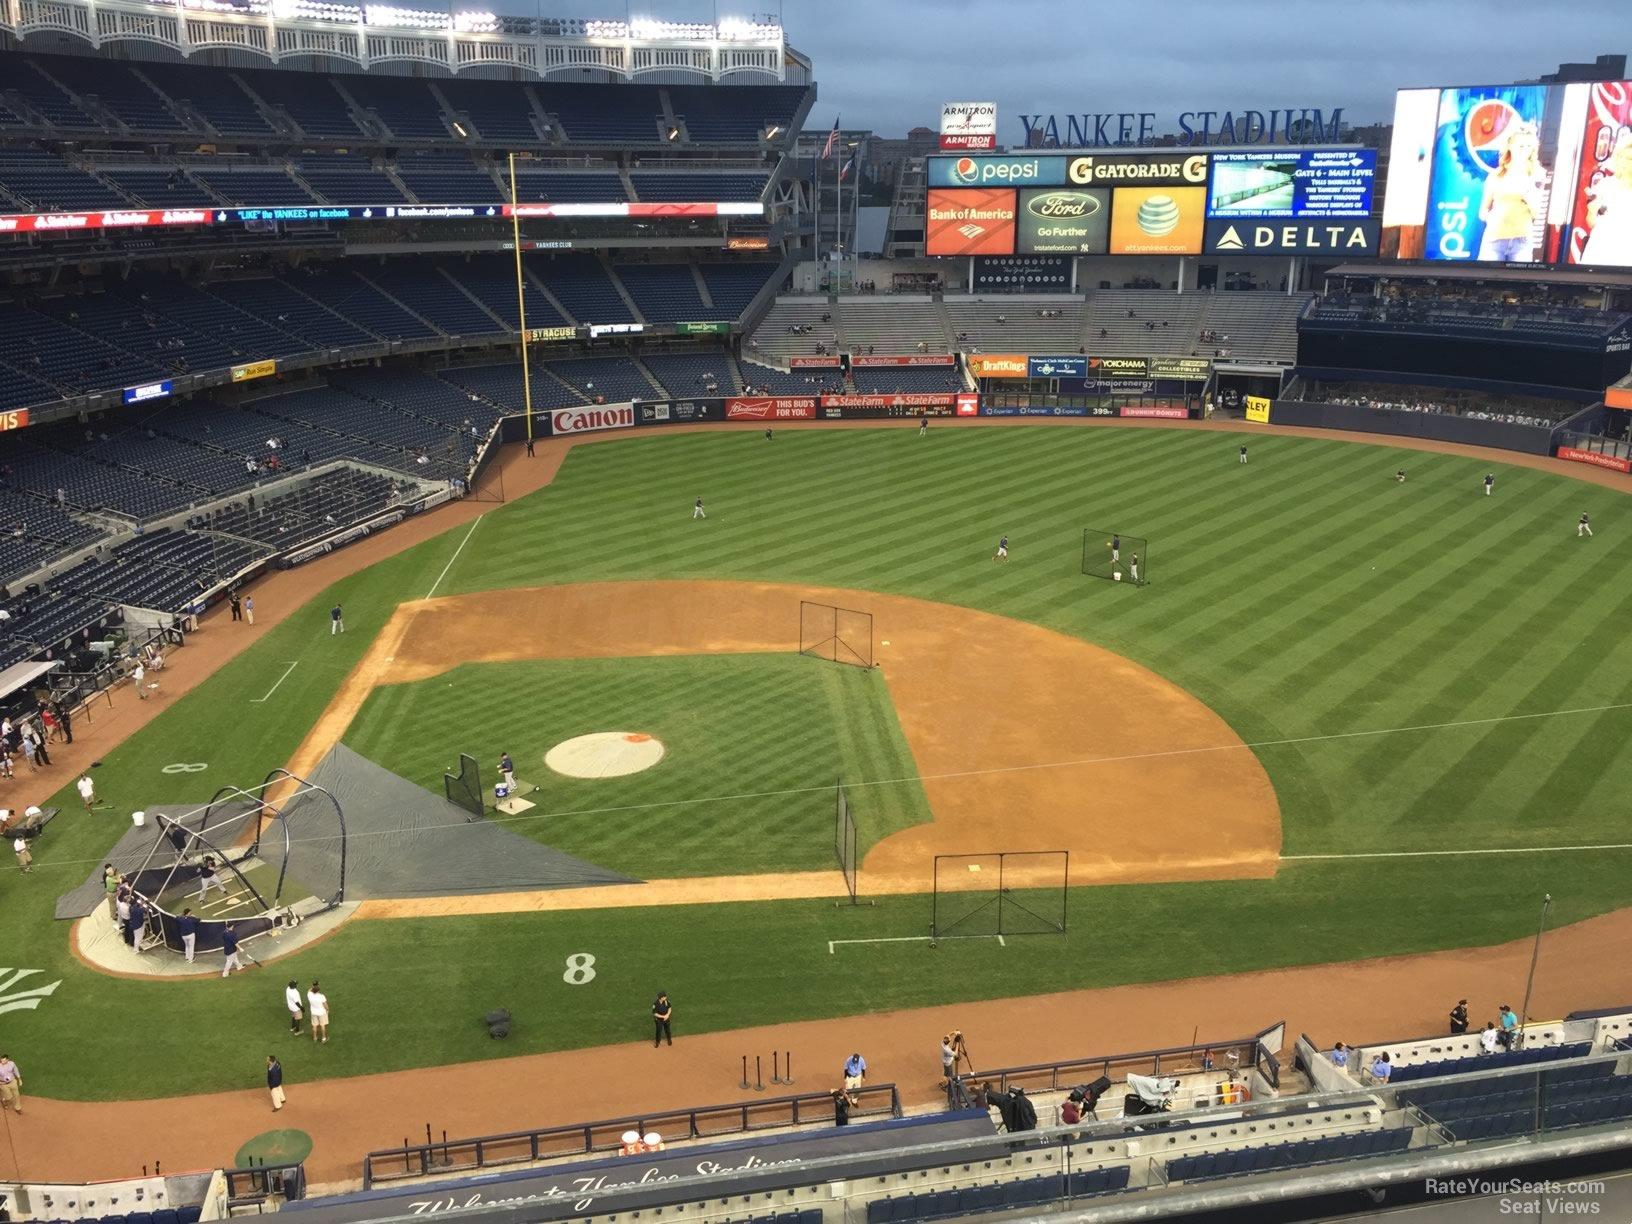 Yankee Stadium Section 316 - New York Yankees - RateYourSeats.com